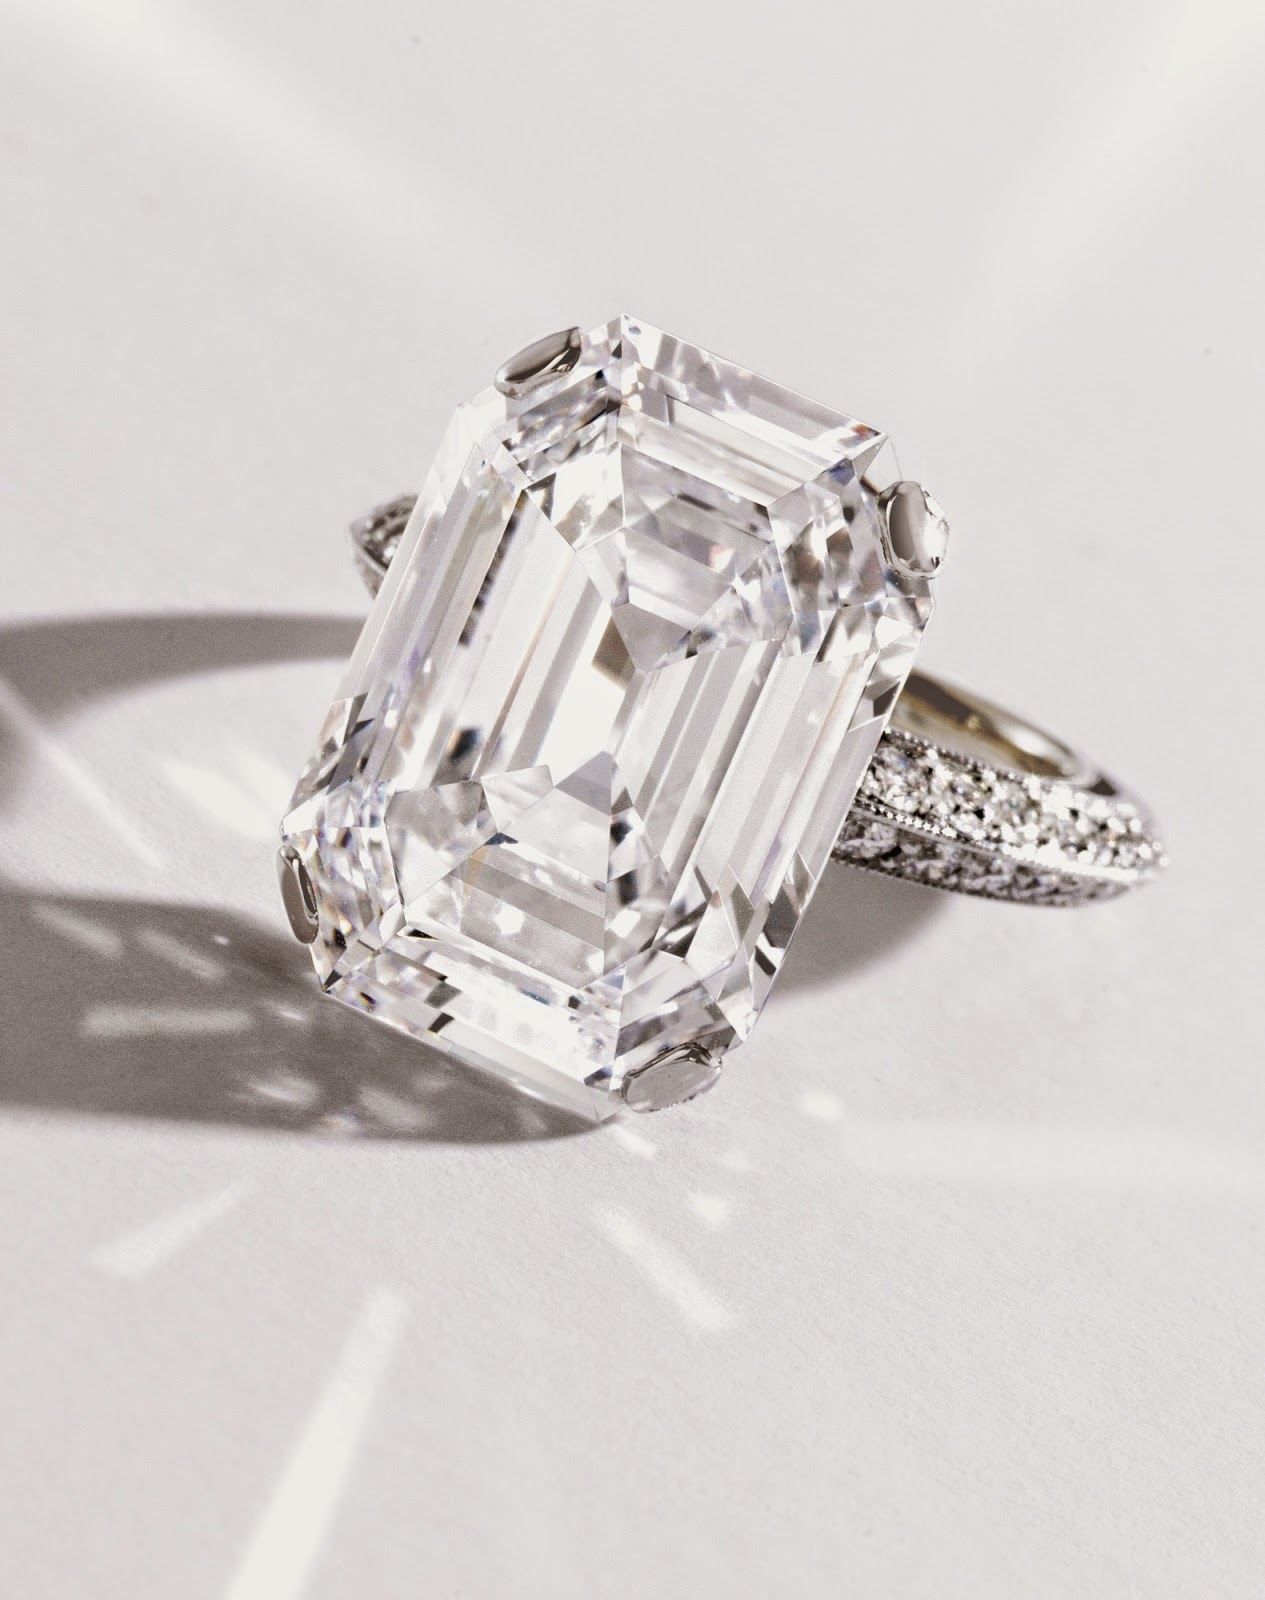 Van Cleef Wedding Bands 74 Ideal Platinum and Diamond Ring